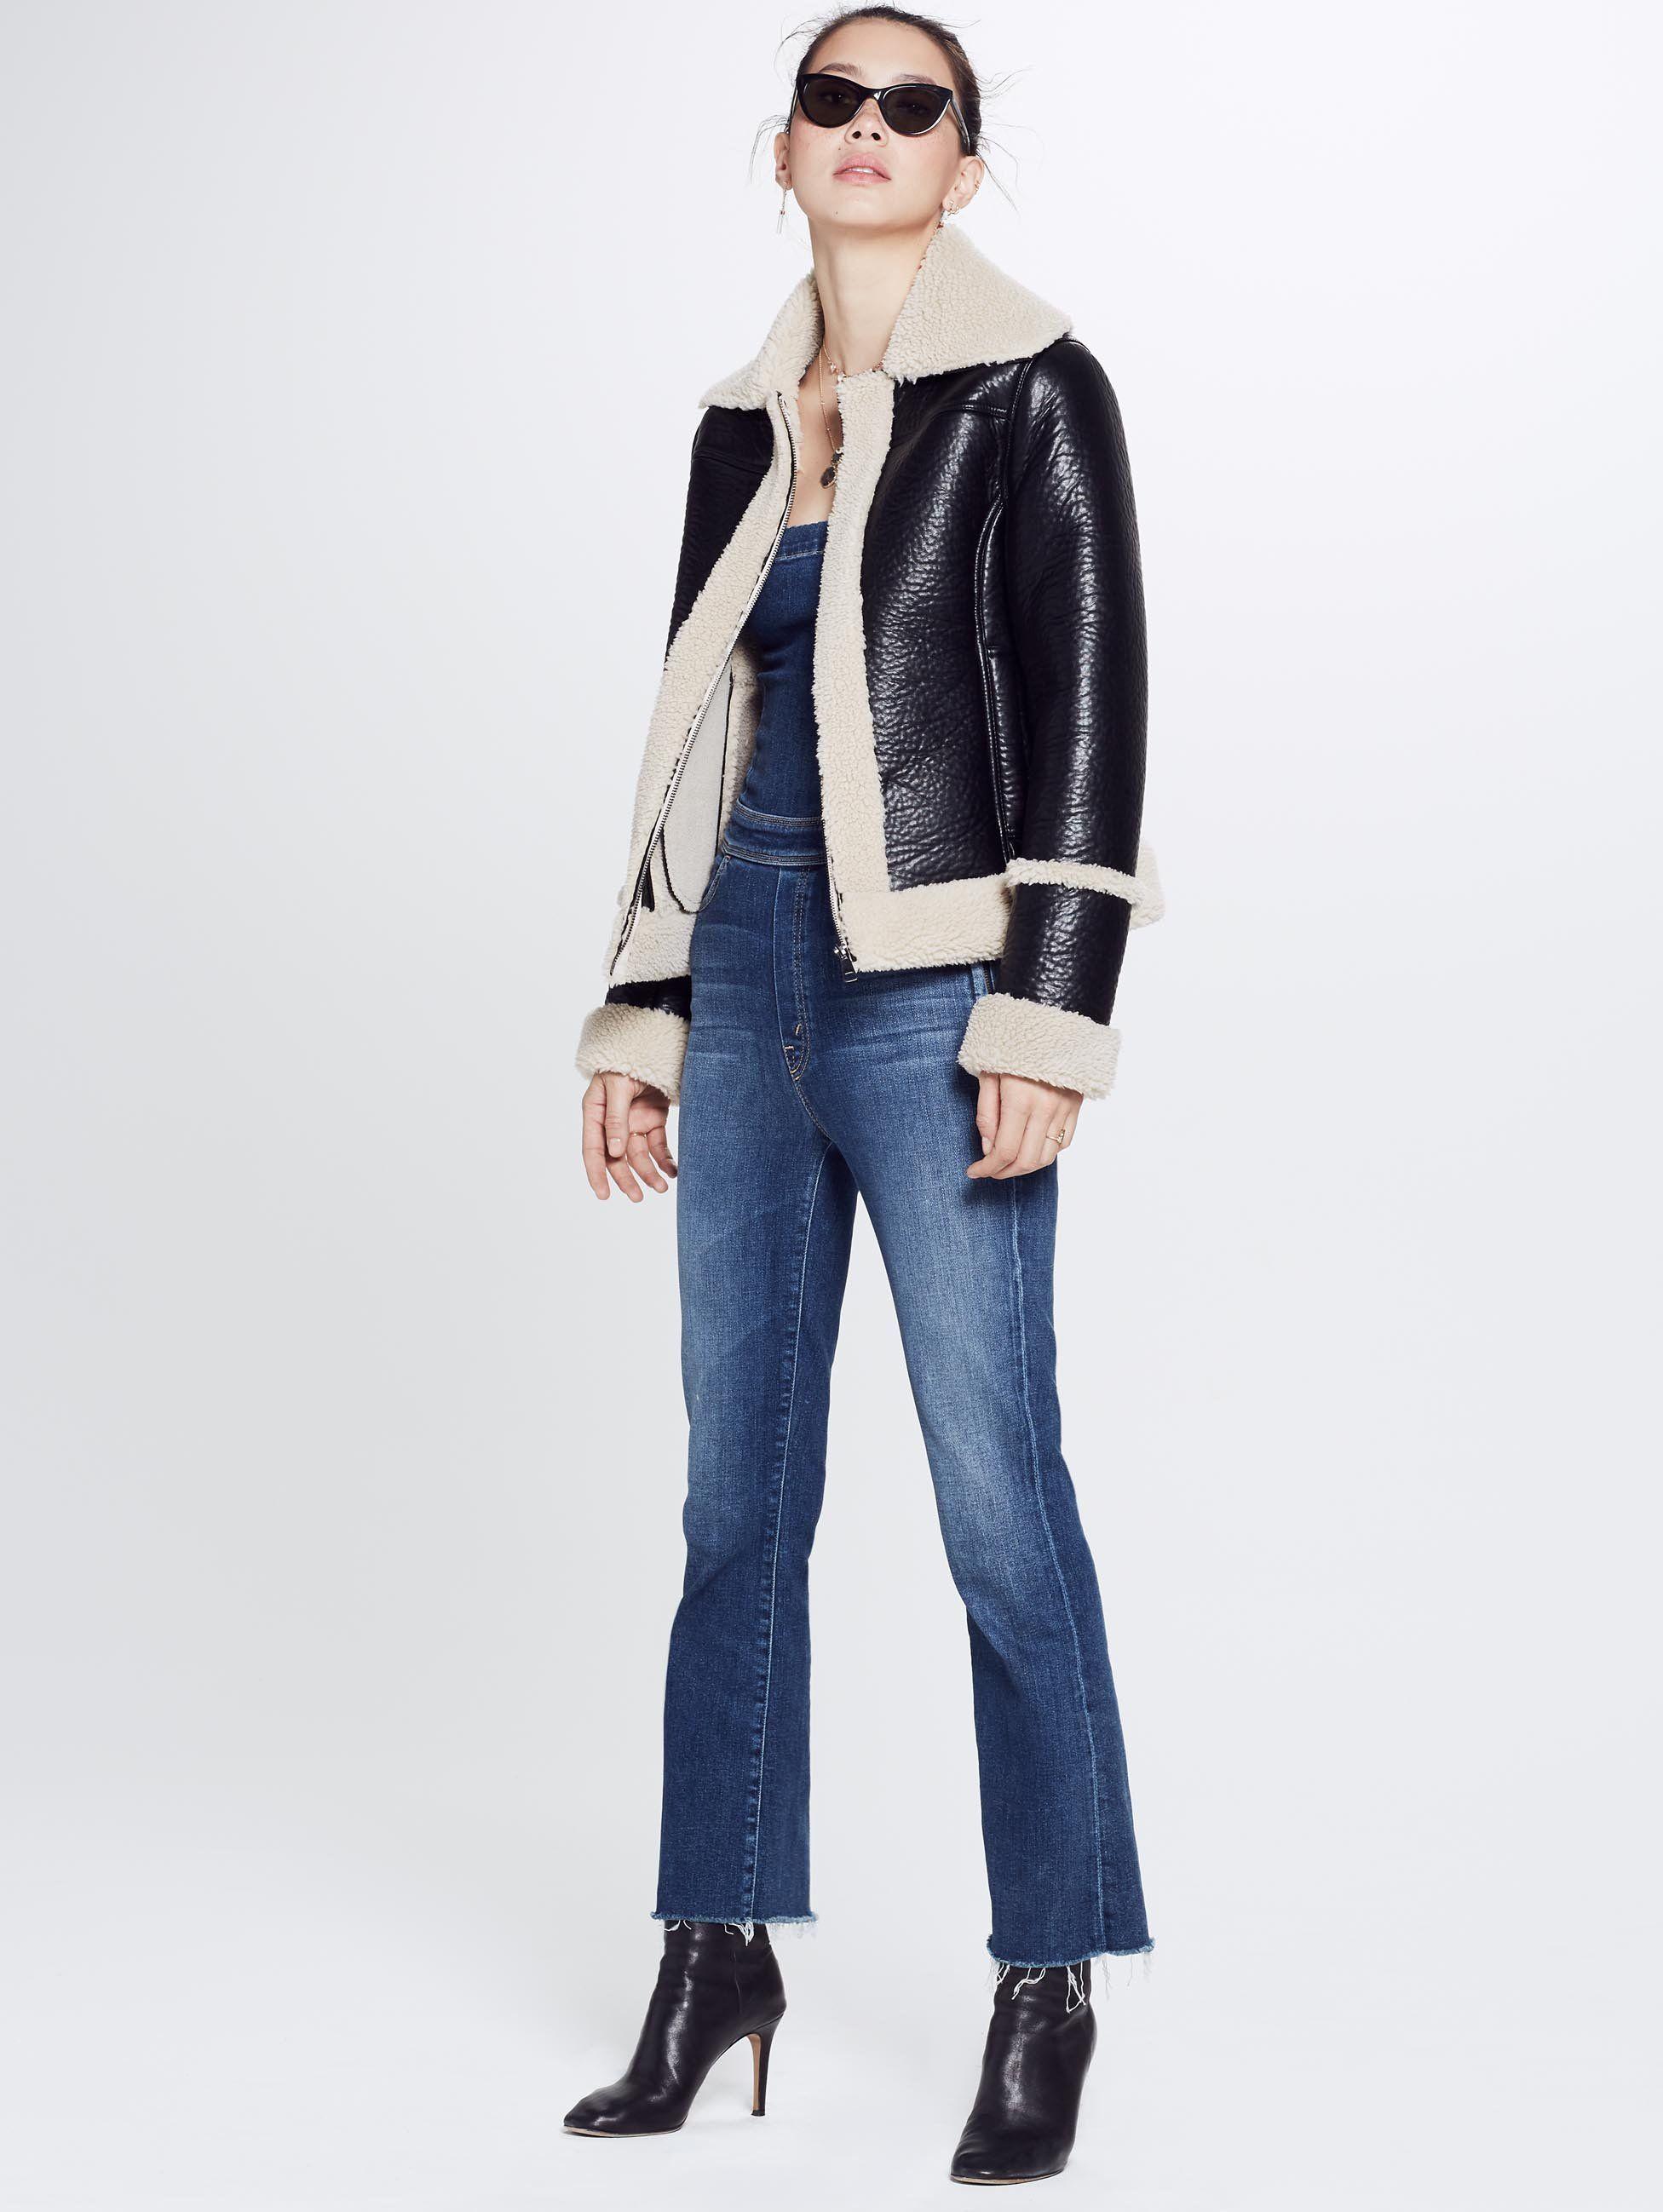 Tees Faux Fur Jacket Fur Jacket Jackets